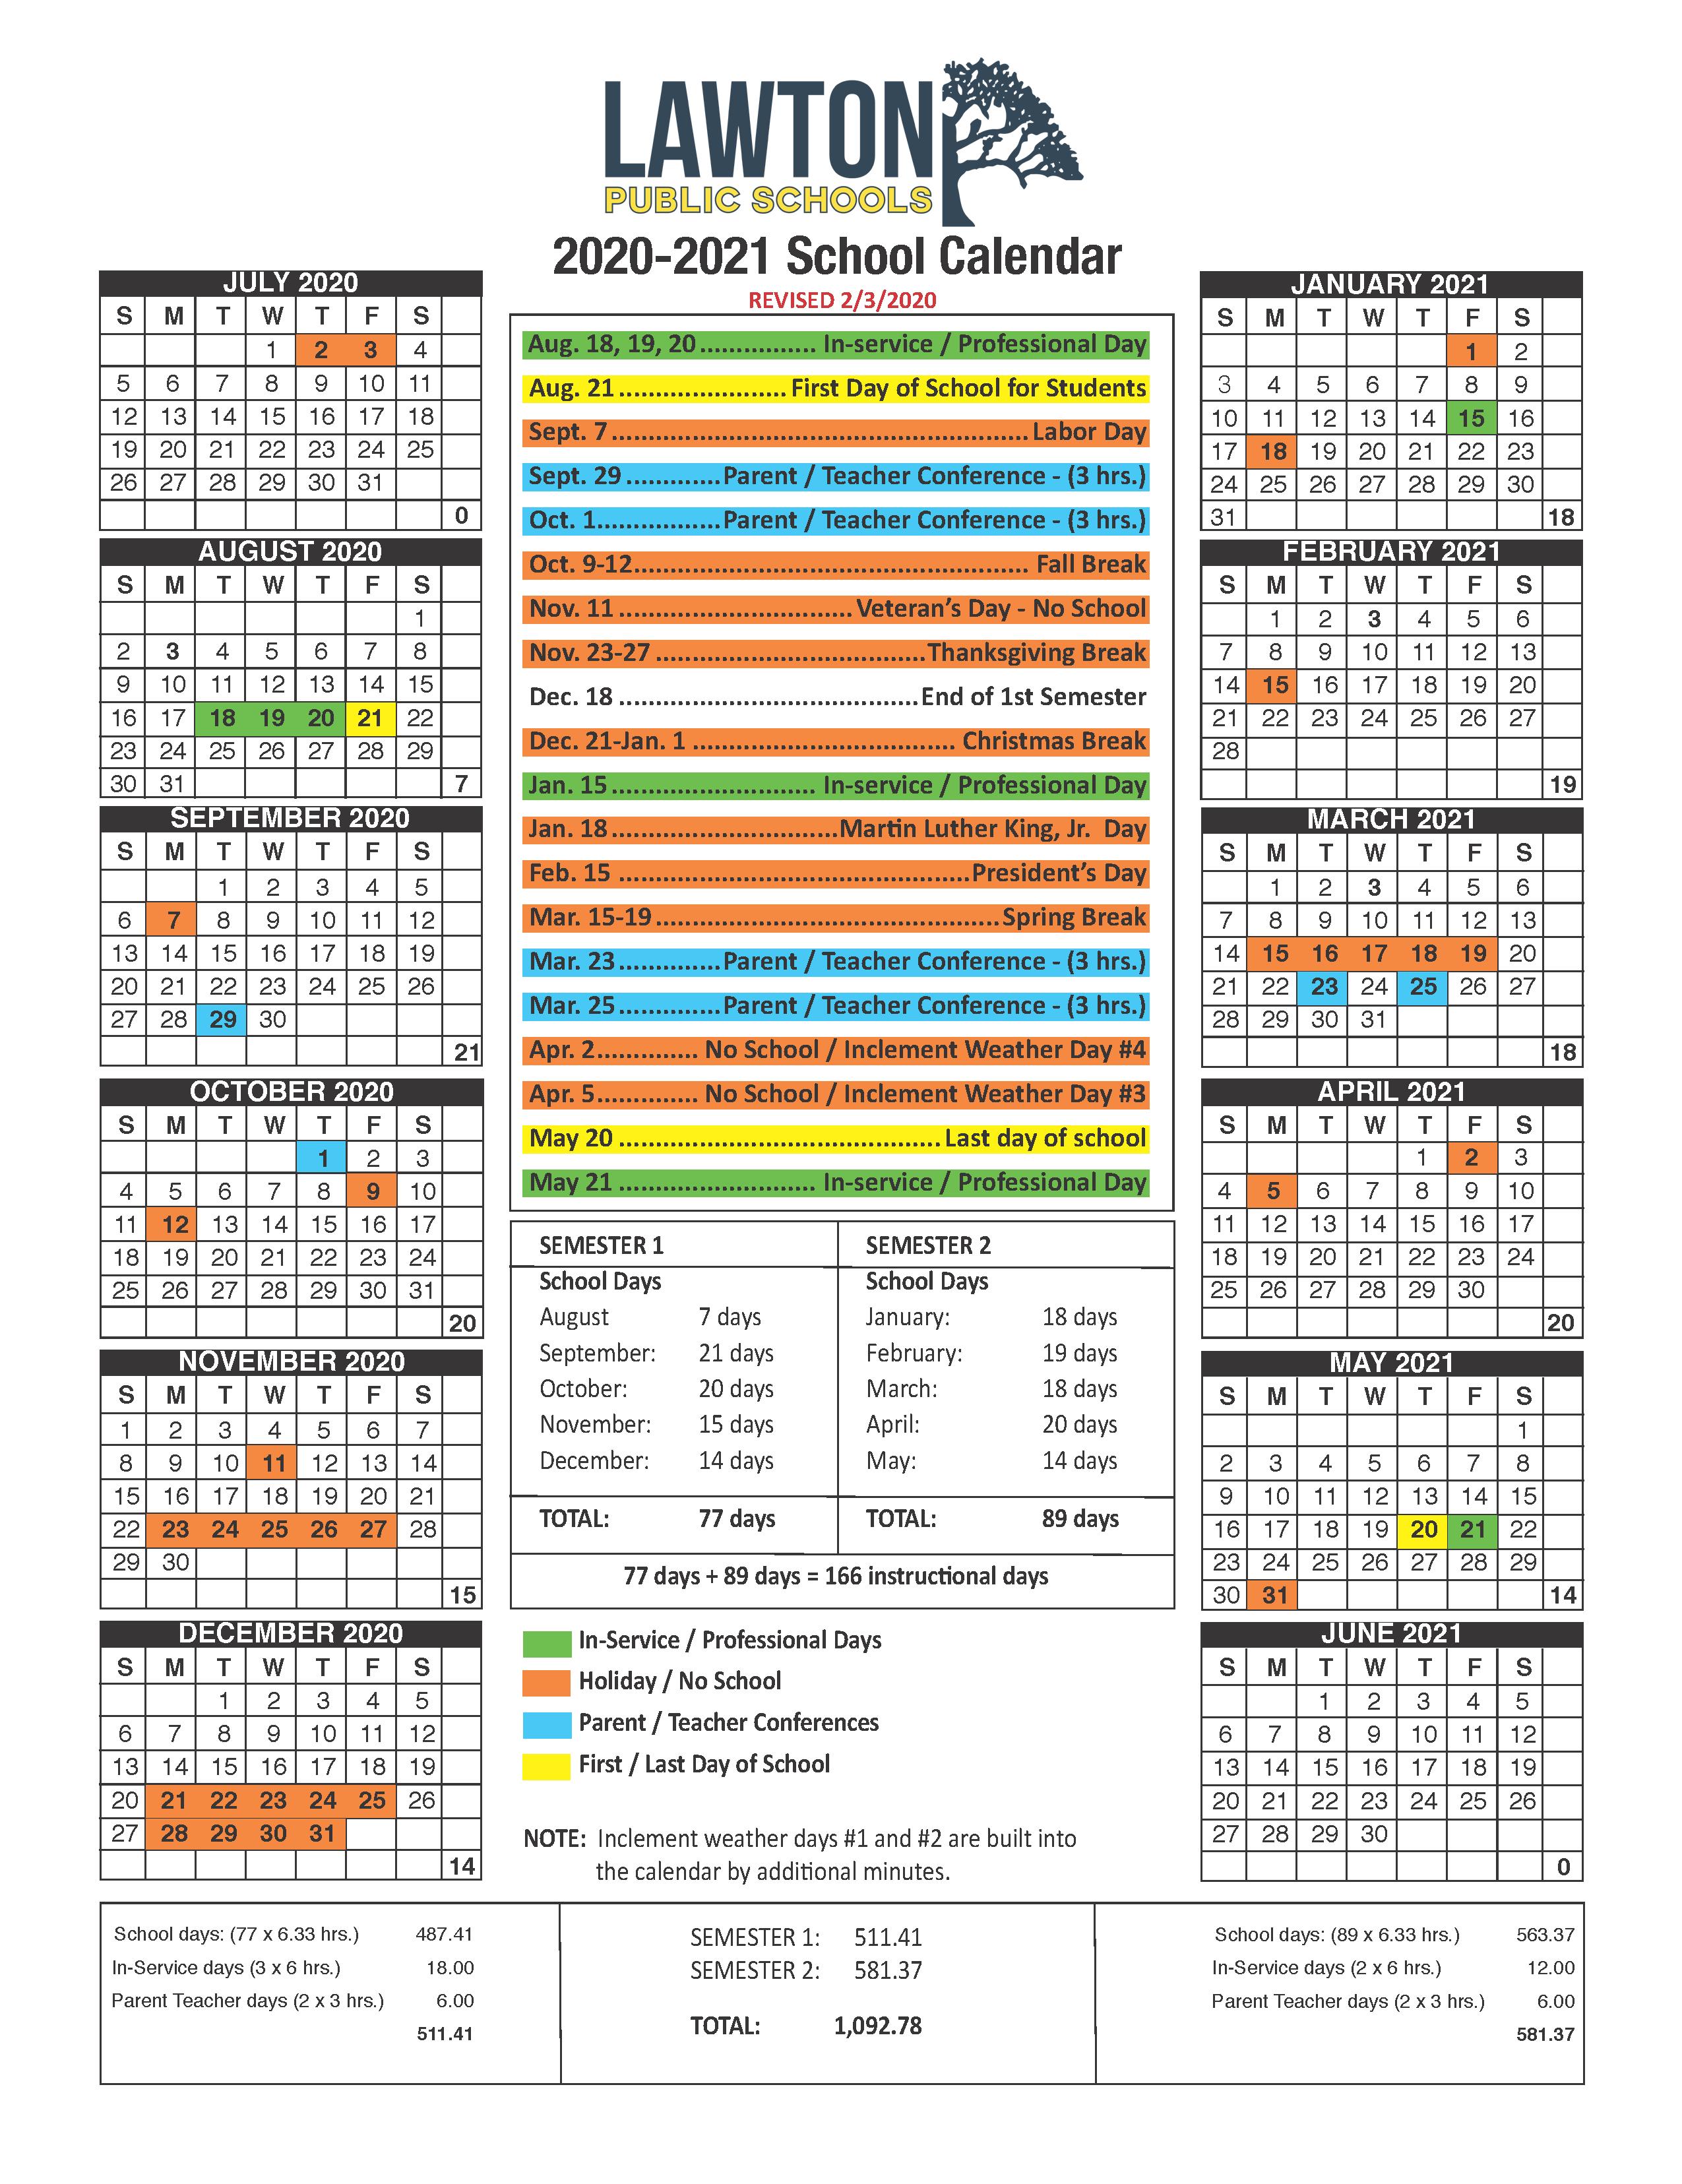 West Hills High School Calendar | Printable Calendar 2020-2021 pertaining to Las Cruces Public Schools Calendar 2021-20